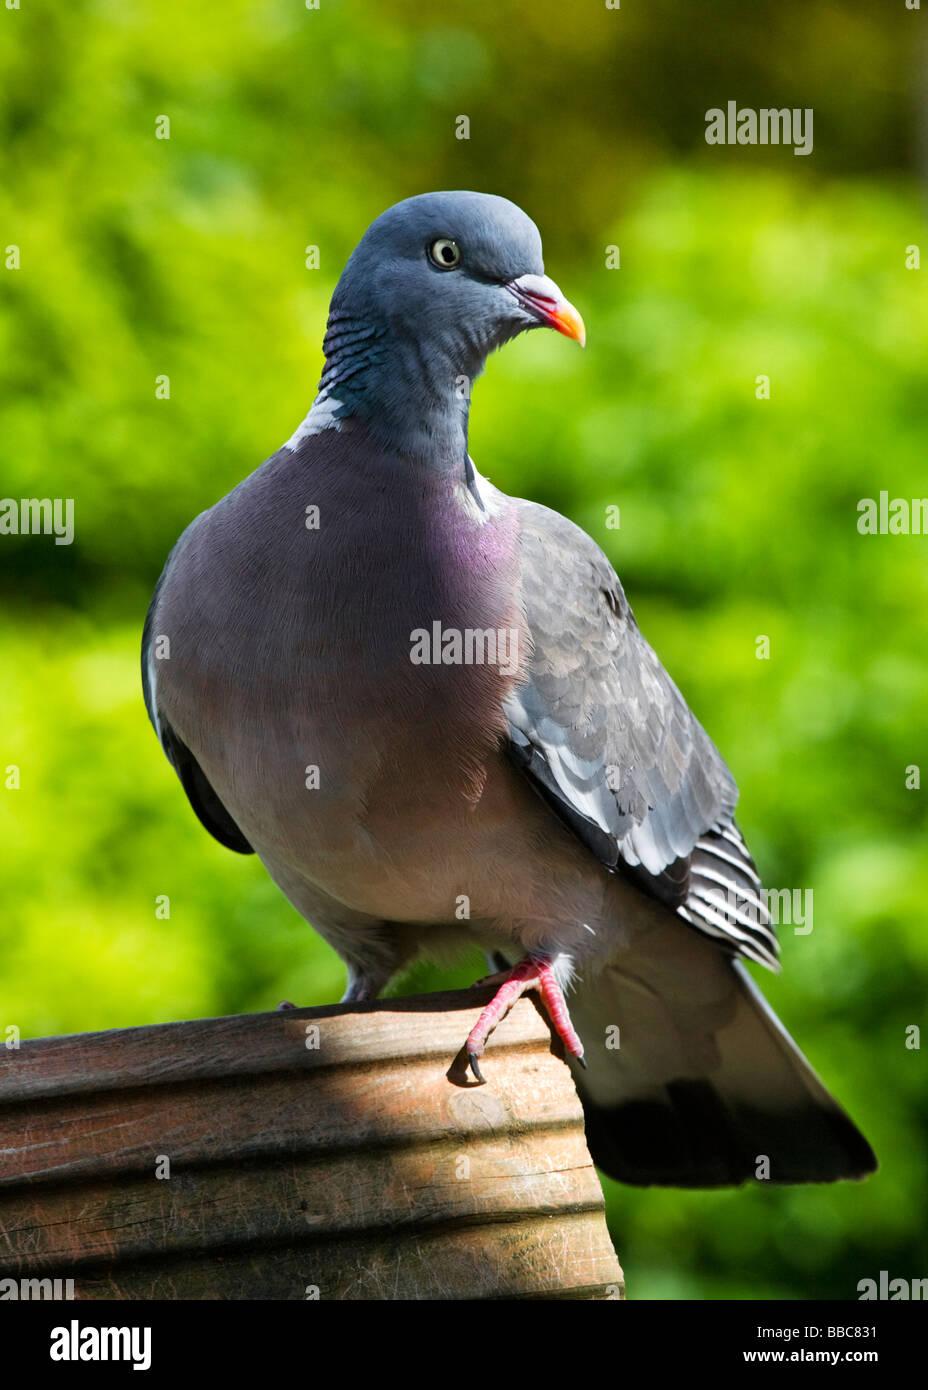 A Wood Pigeon Columba palumbus, perched on top of a garden bird house. - Stock Image